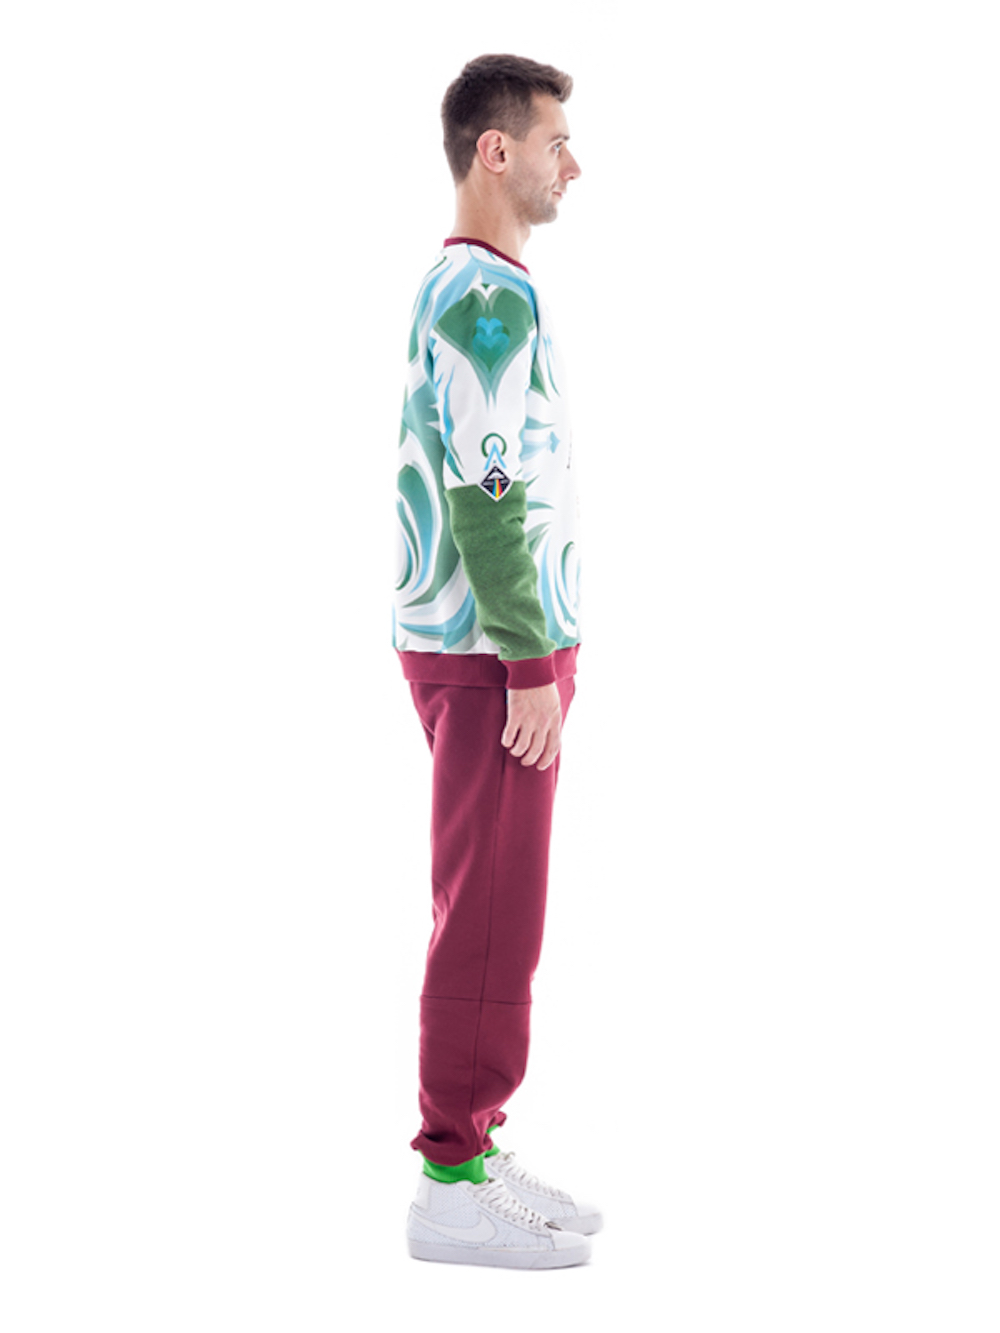 Carabus Sweatshirt (Green) - Okuaku